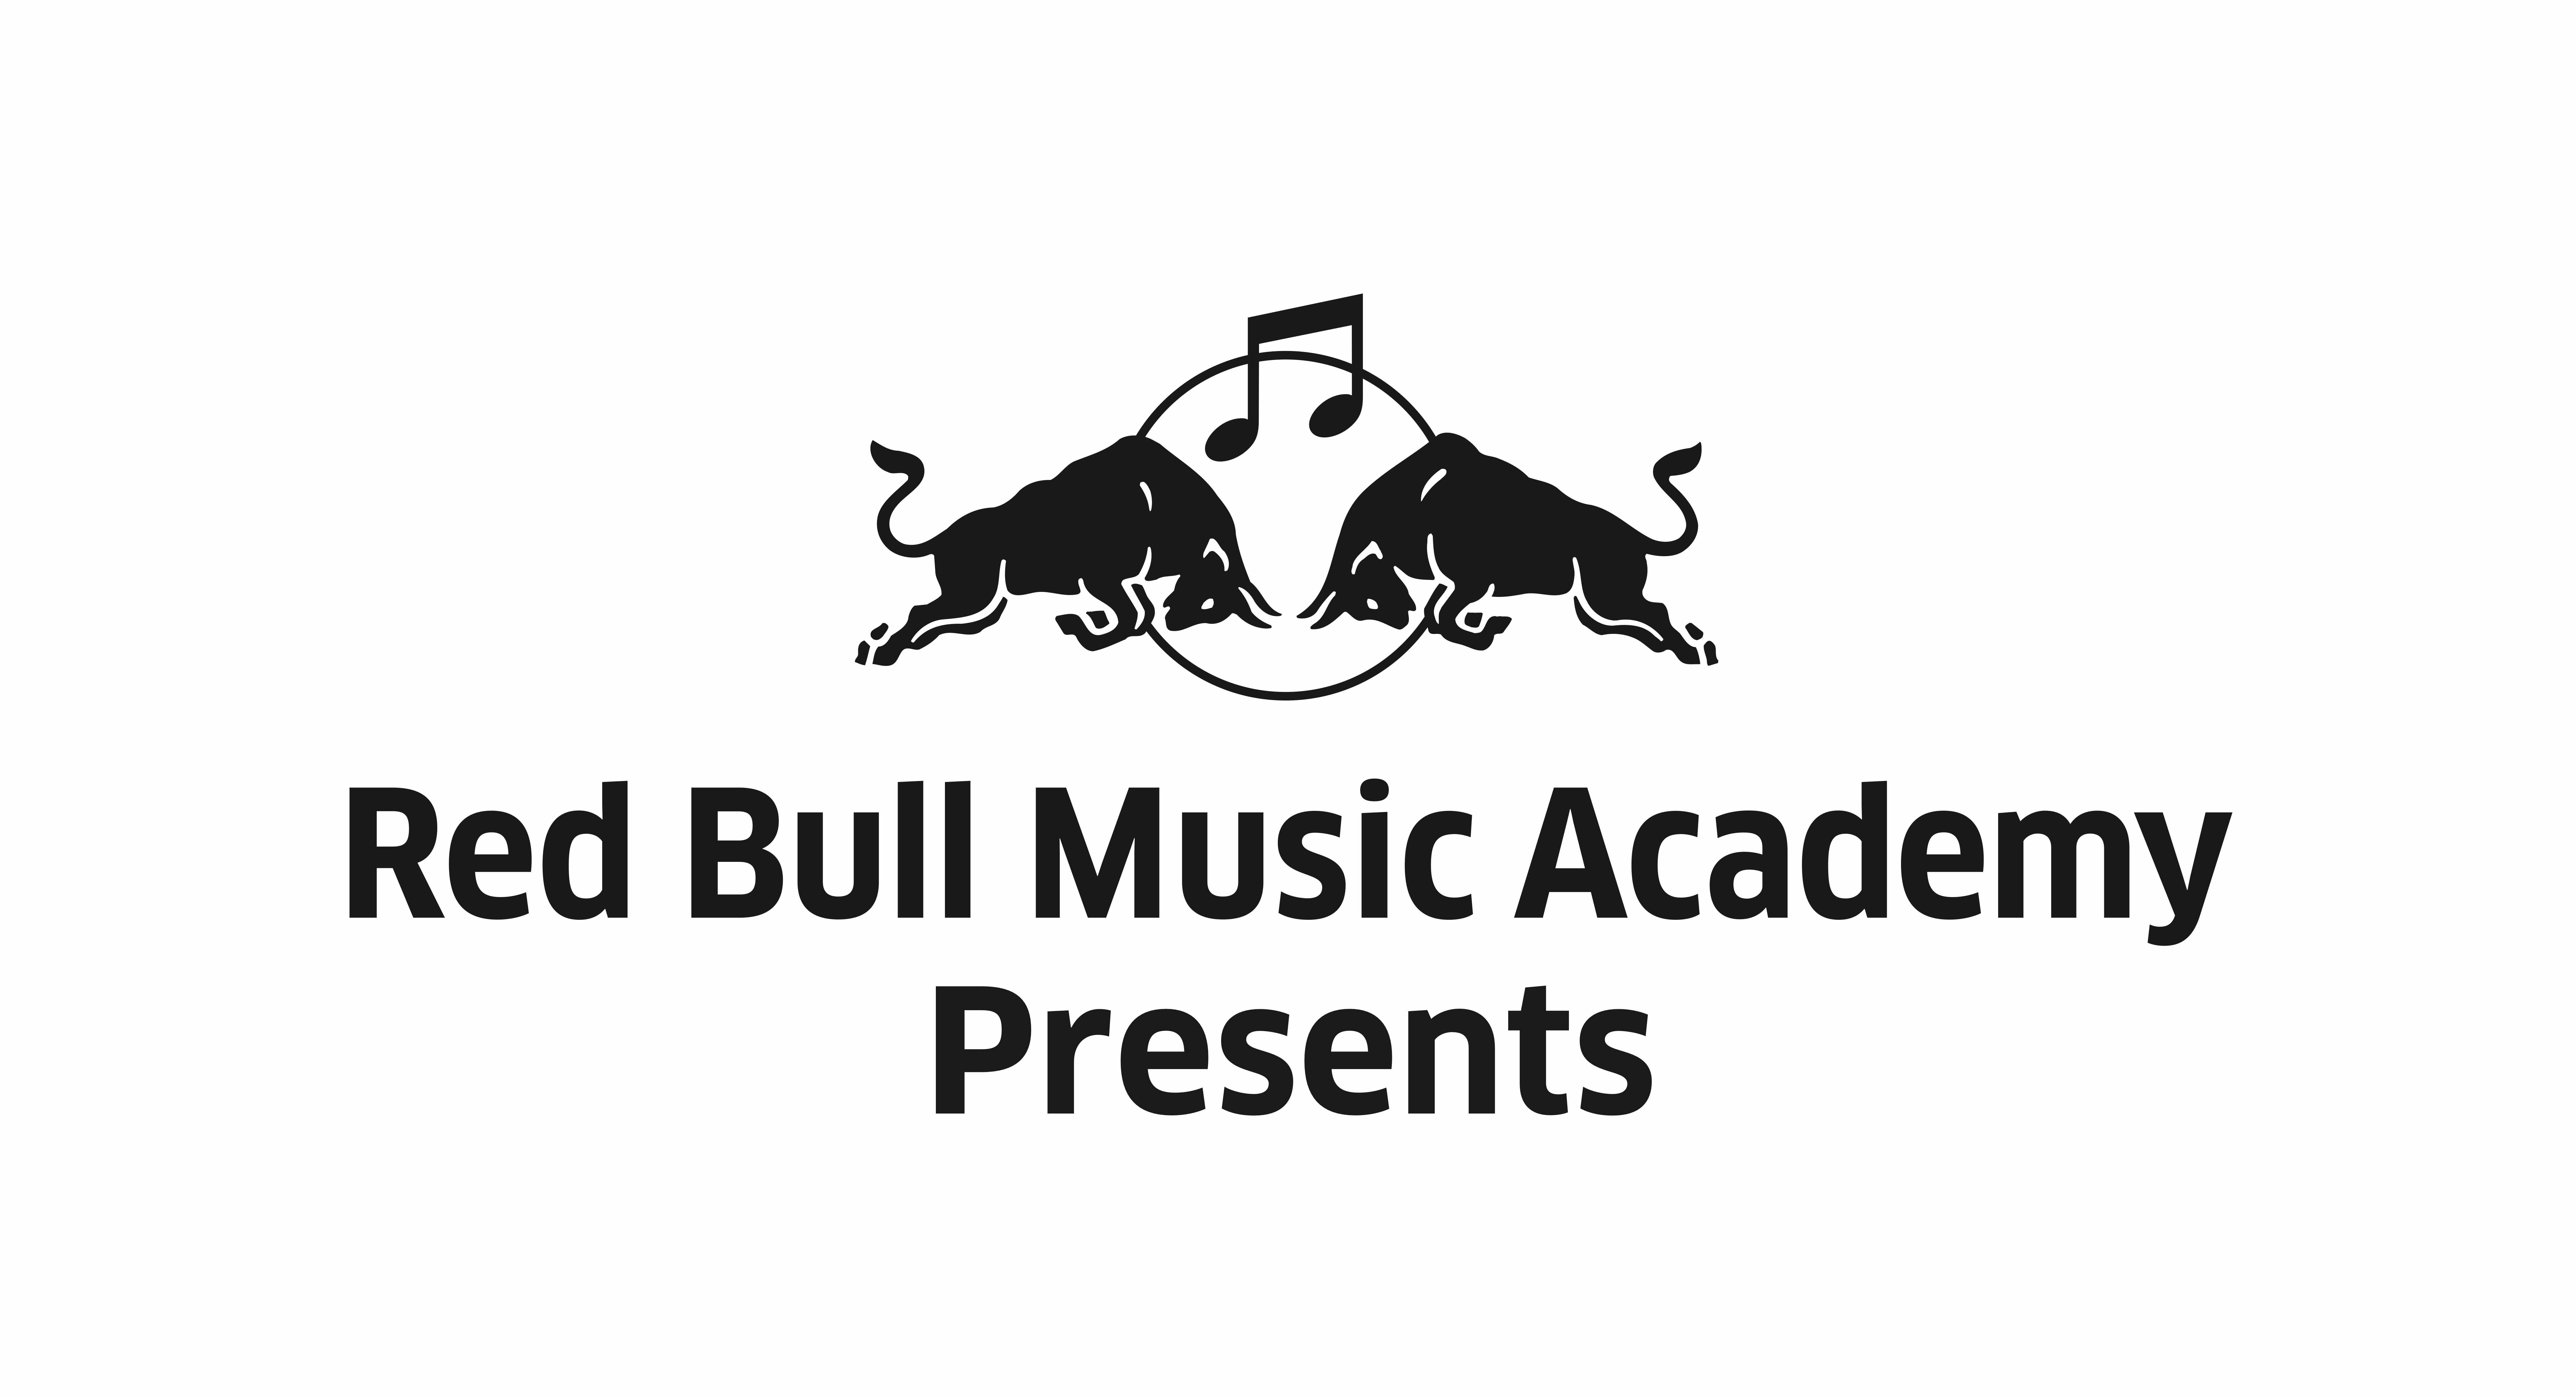 Redbull Music Academy Presents..